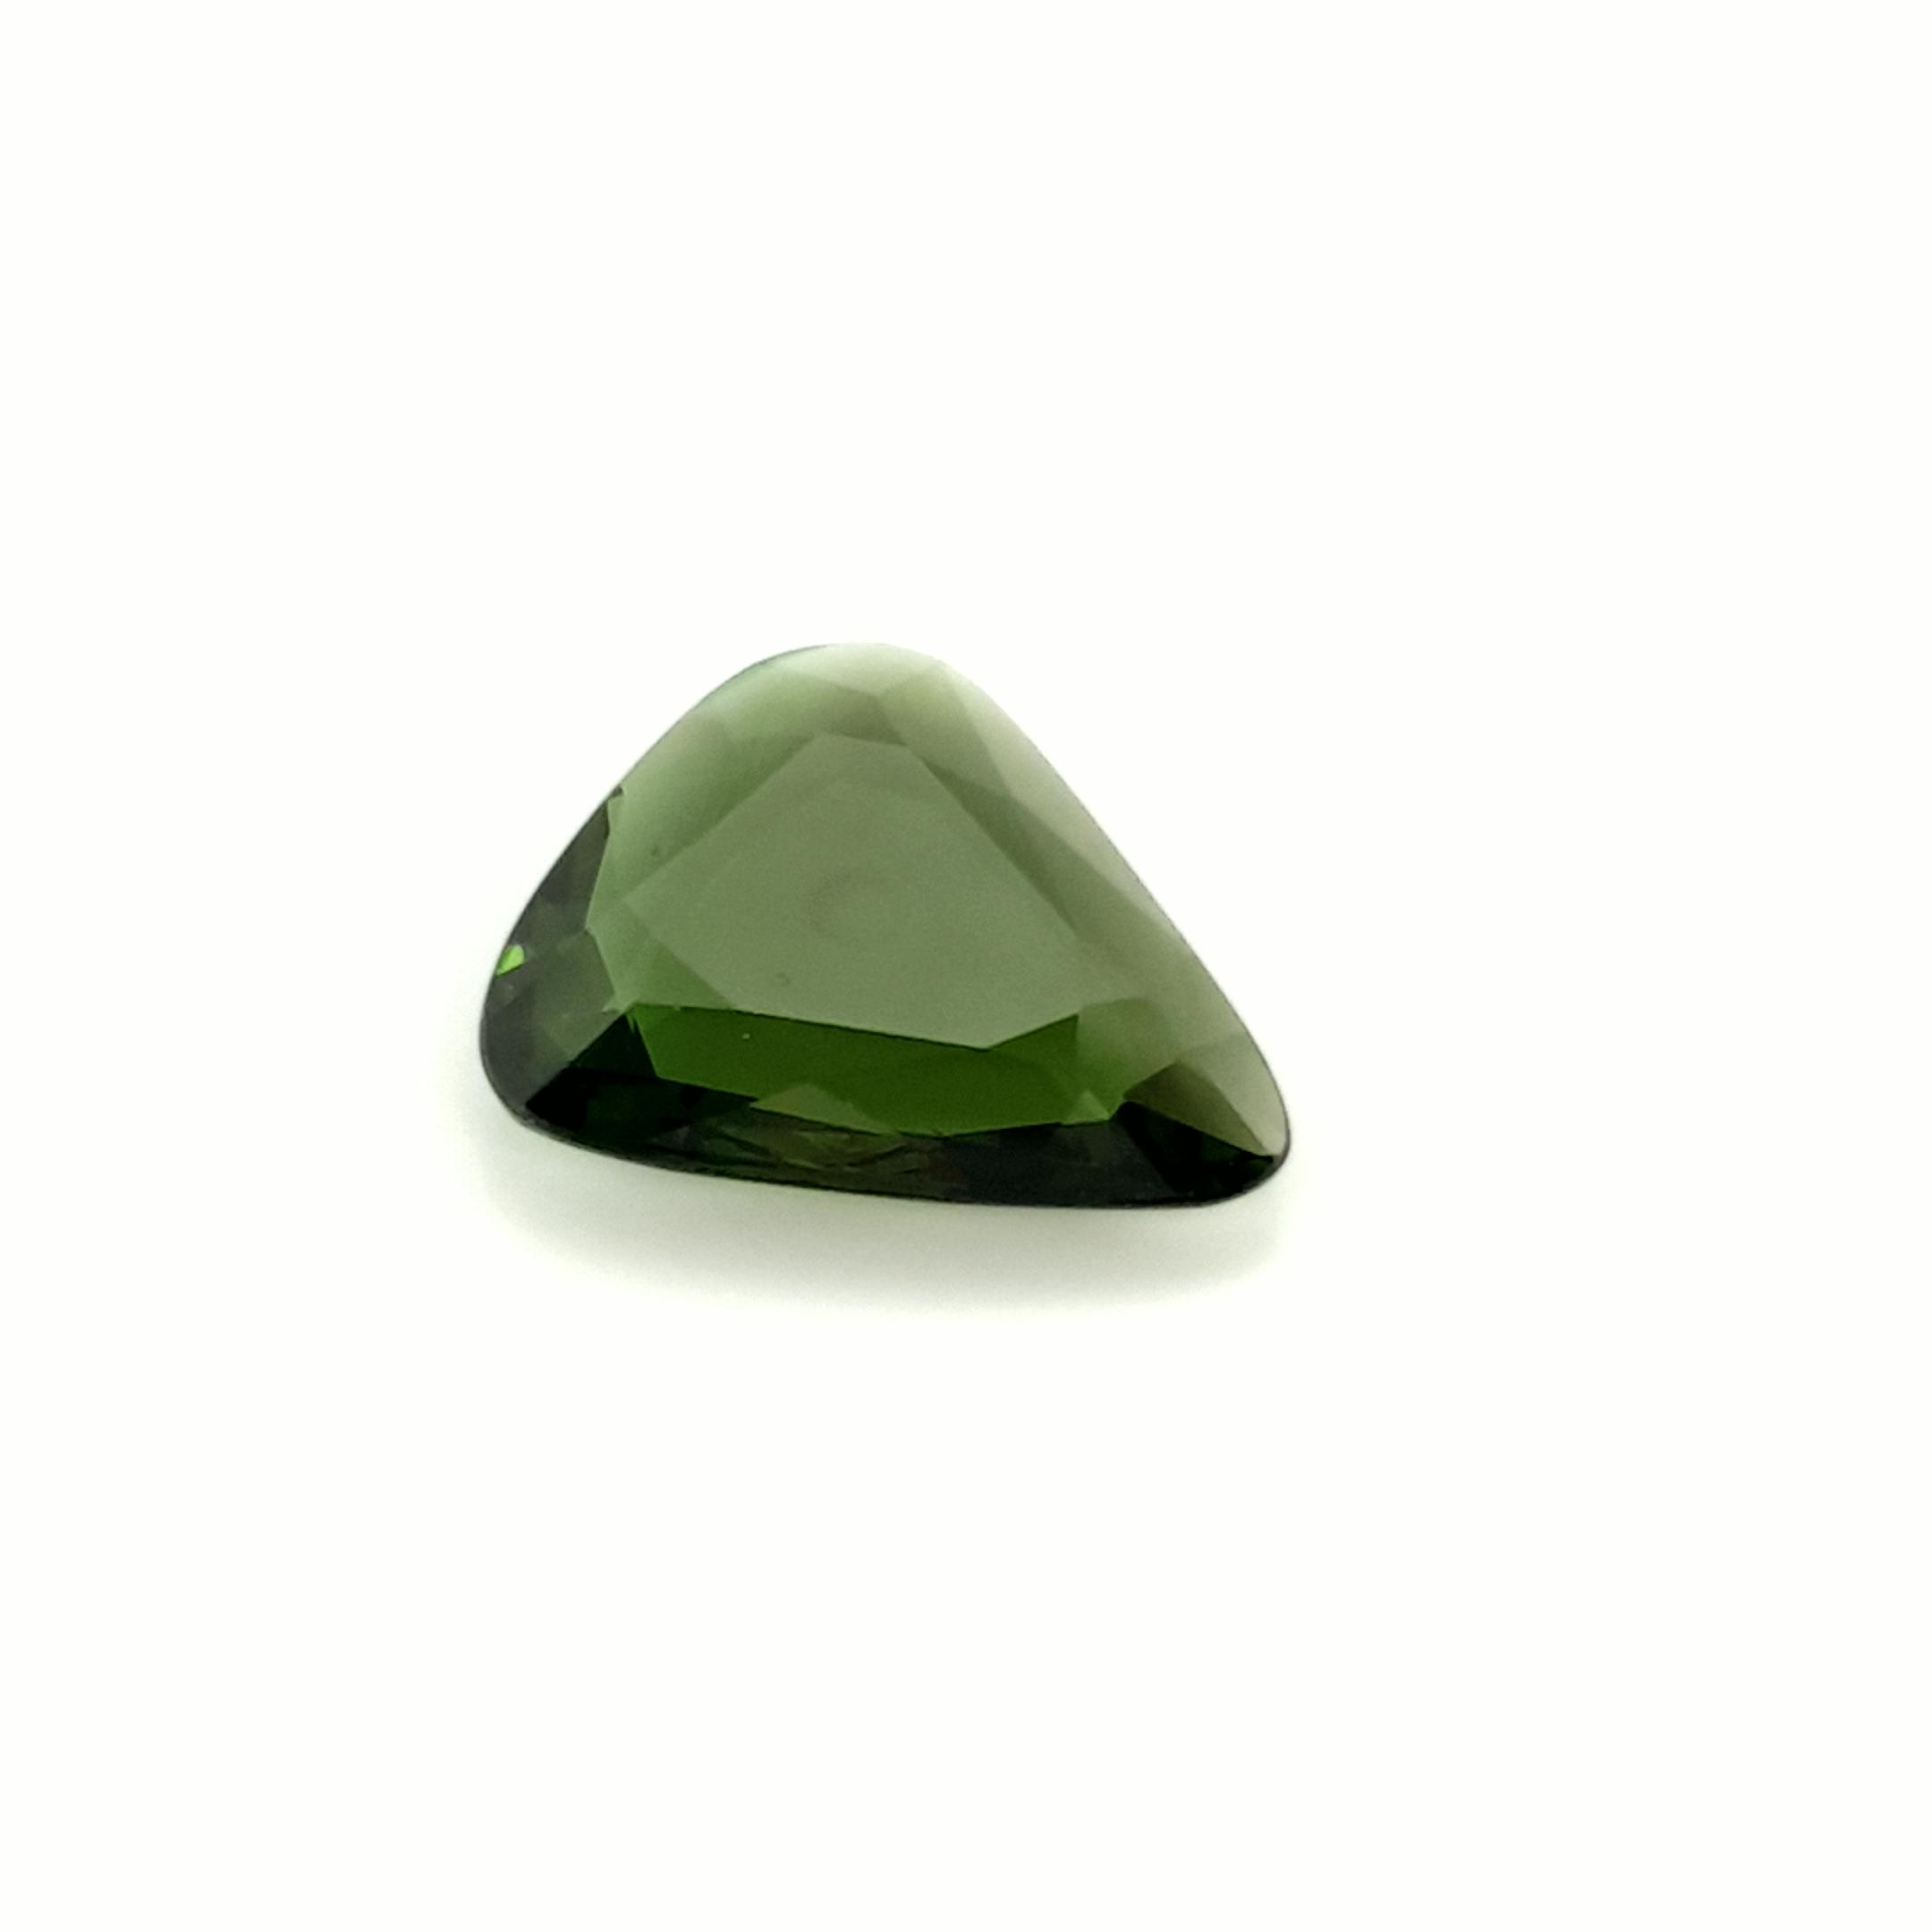 5,60ct. Imperial Green Tourmalin DoubleRoseCut TMA14C31 ClaudiaHamann__2021-02-11-16-37-38